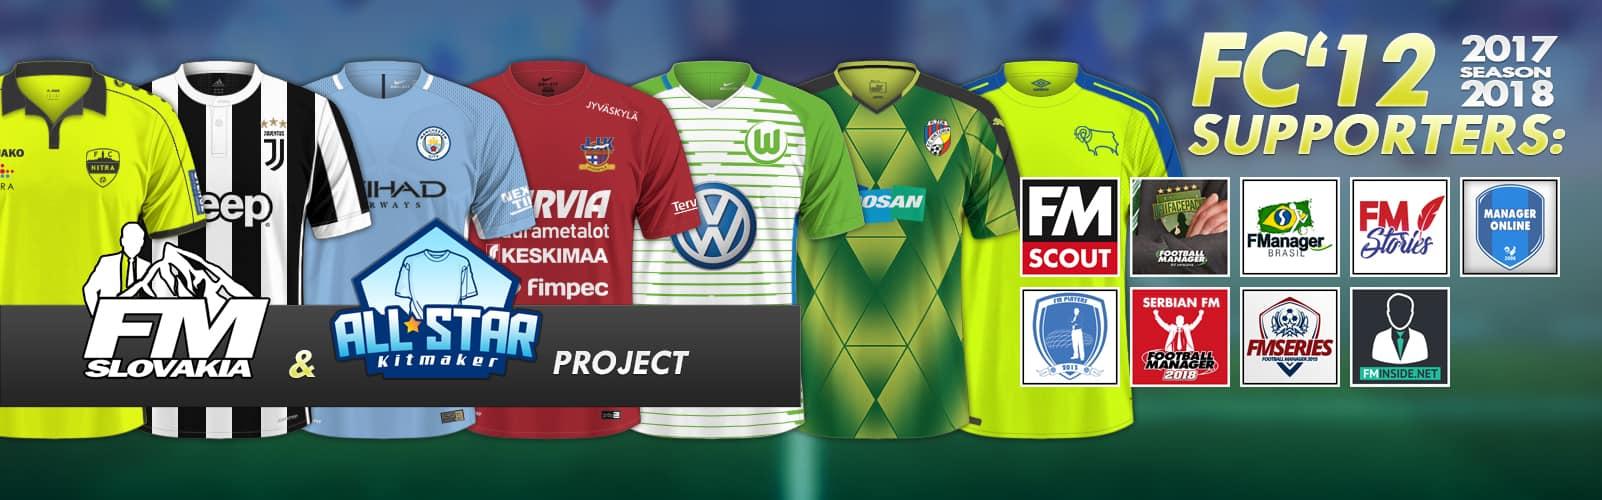 FM Slovakia and Igor Natalino bringing you the brand new hotfix for  brazilian kits a specially made for Football Manager 2018 and the 2017 18  season. 63232e9ed